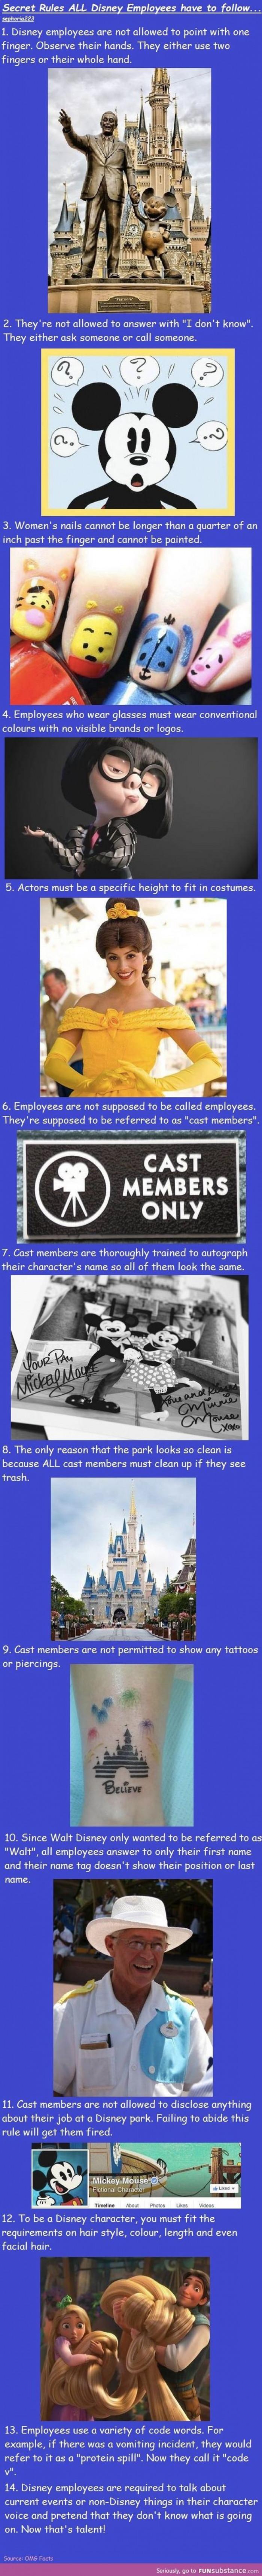 10 Secret Rules Disney Employes Must Follow